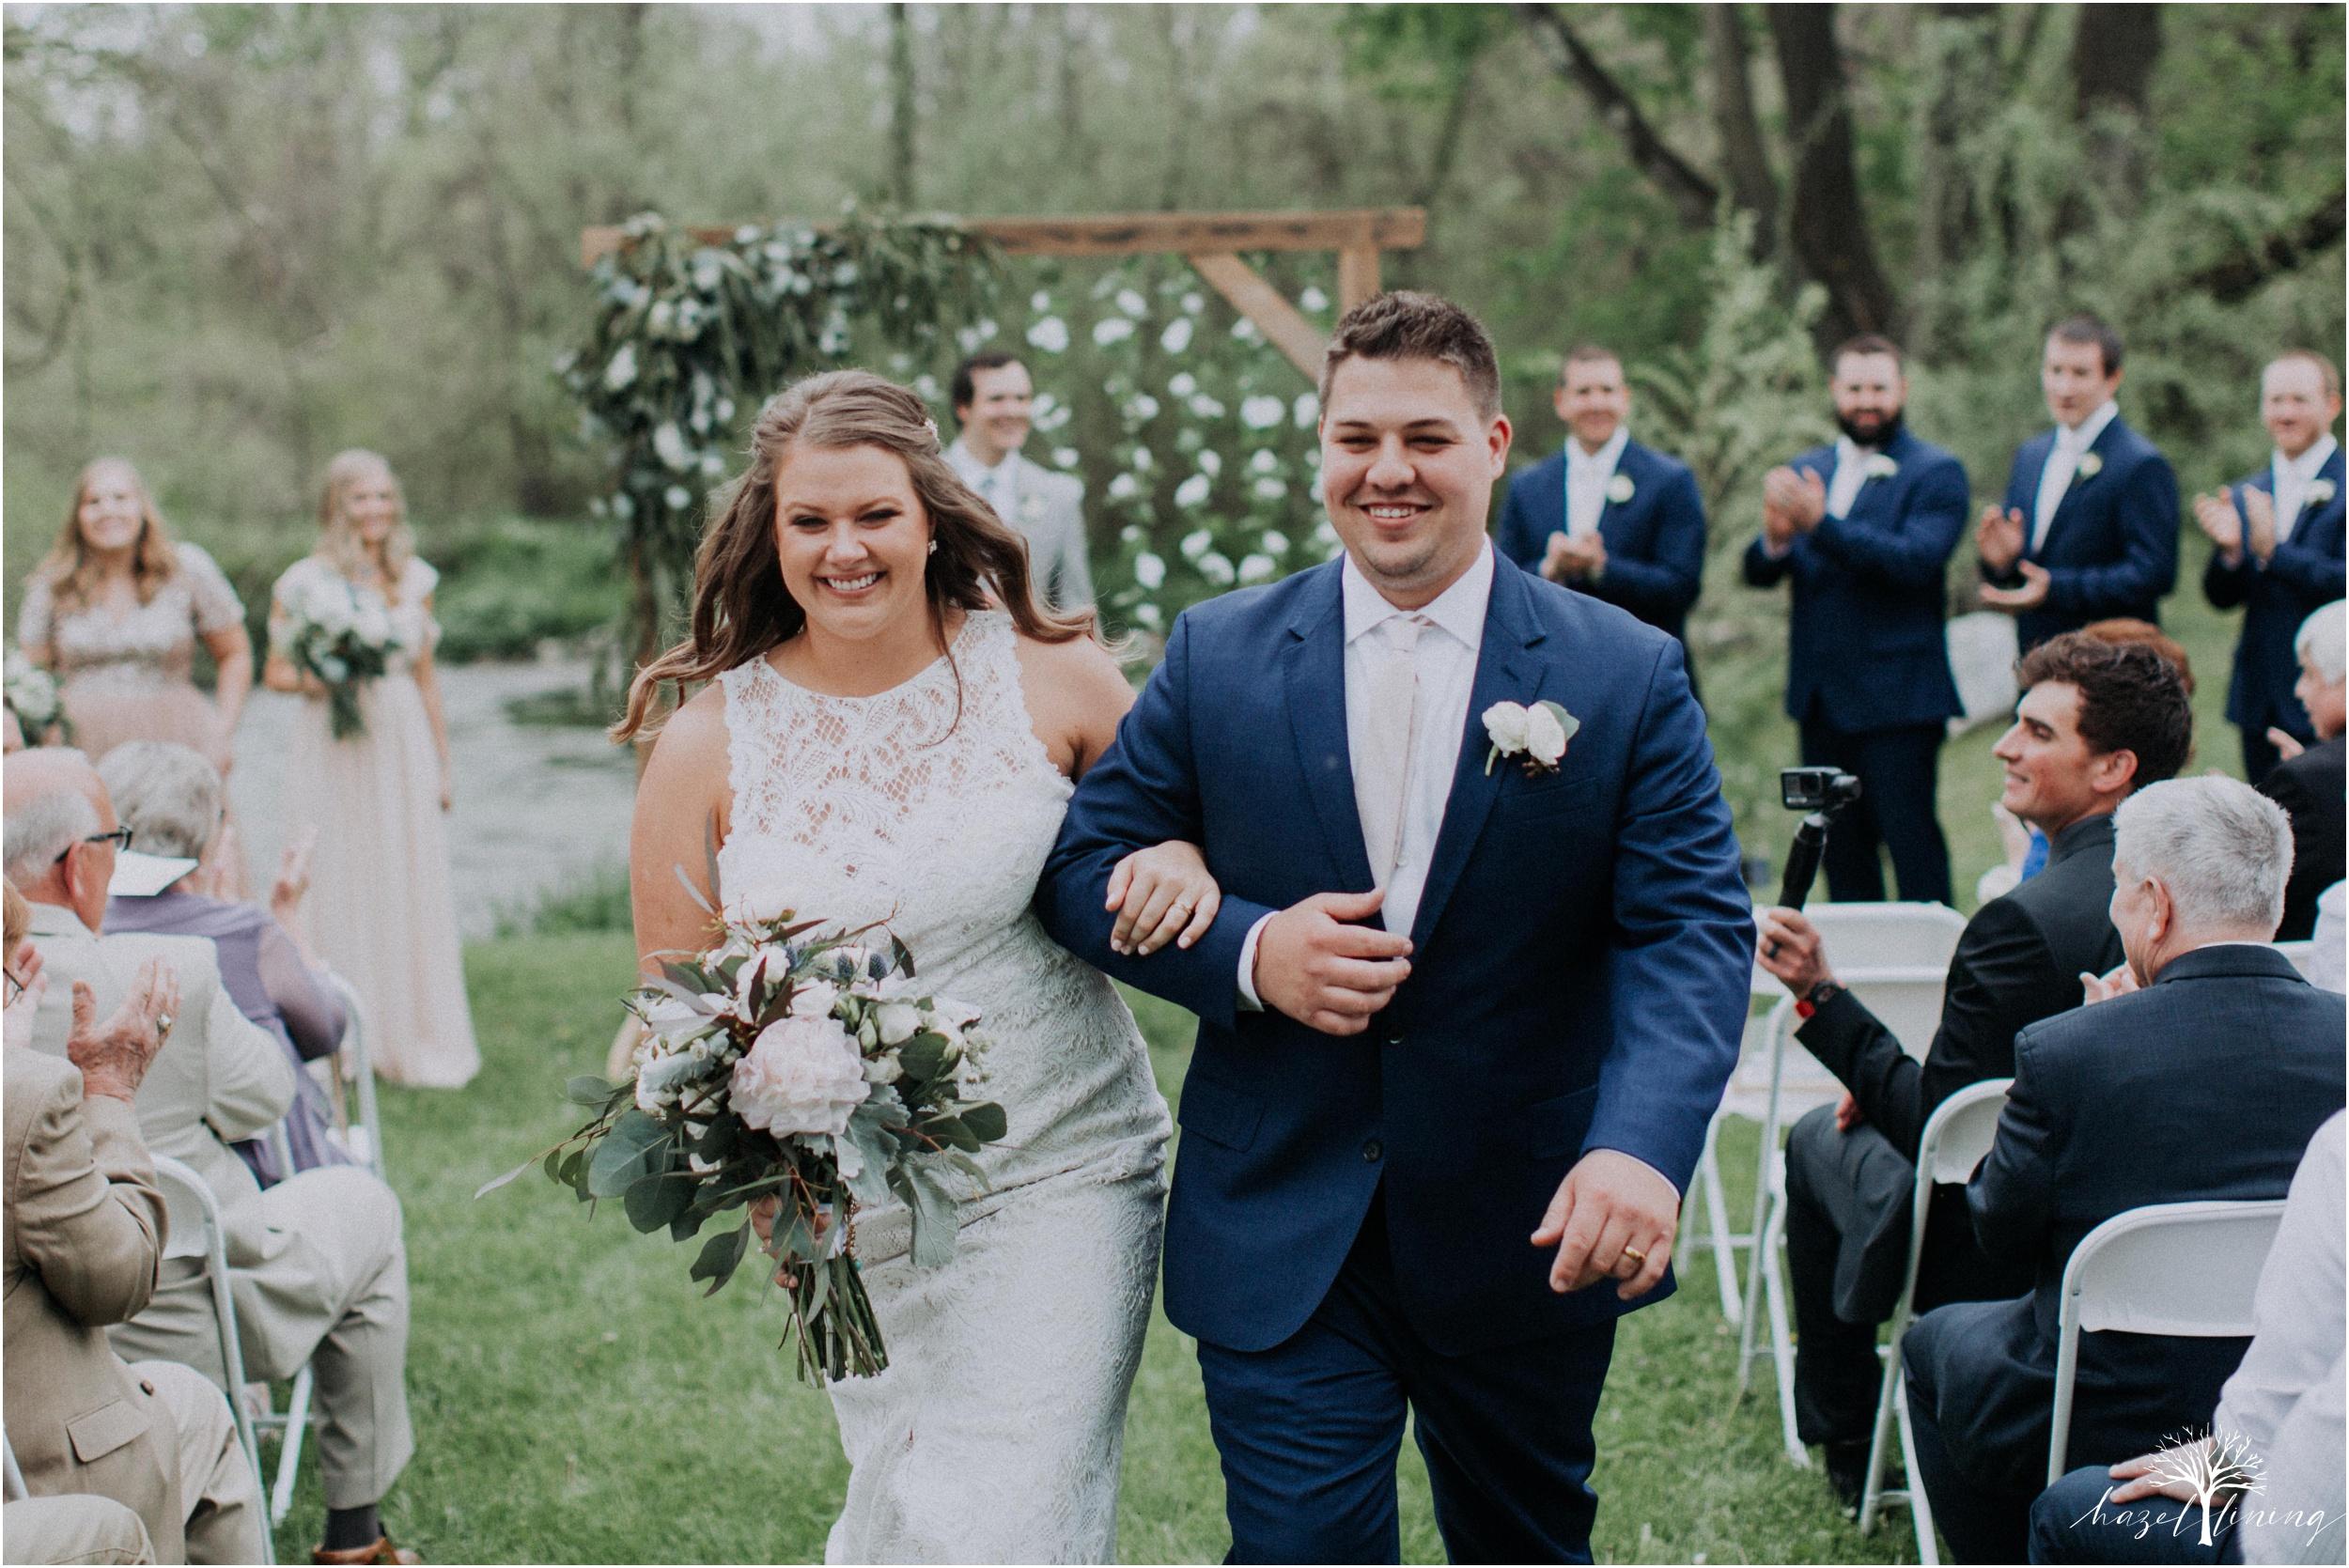 hazel-lining-travel-wedding-elopement-photography-abby-skyler-hunt-the-willis-house-york-pennsylvania-outdoor-estate-wedding_0095.jpg